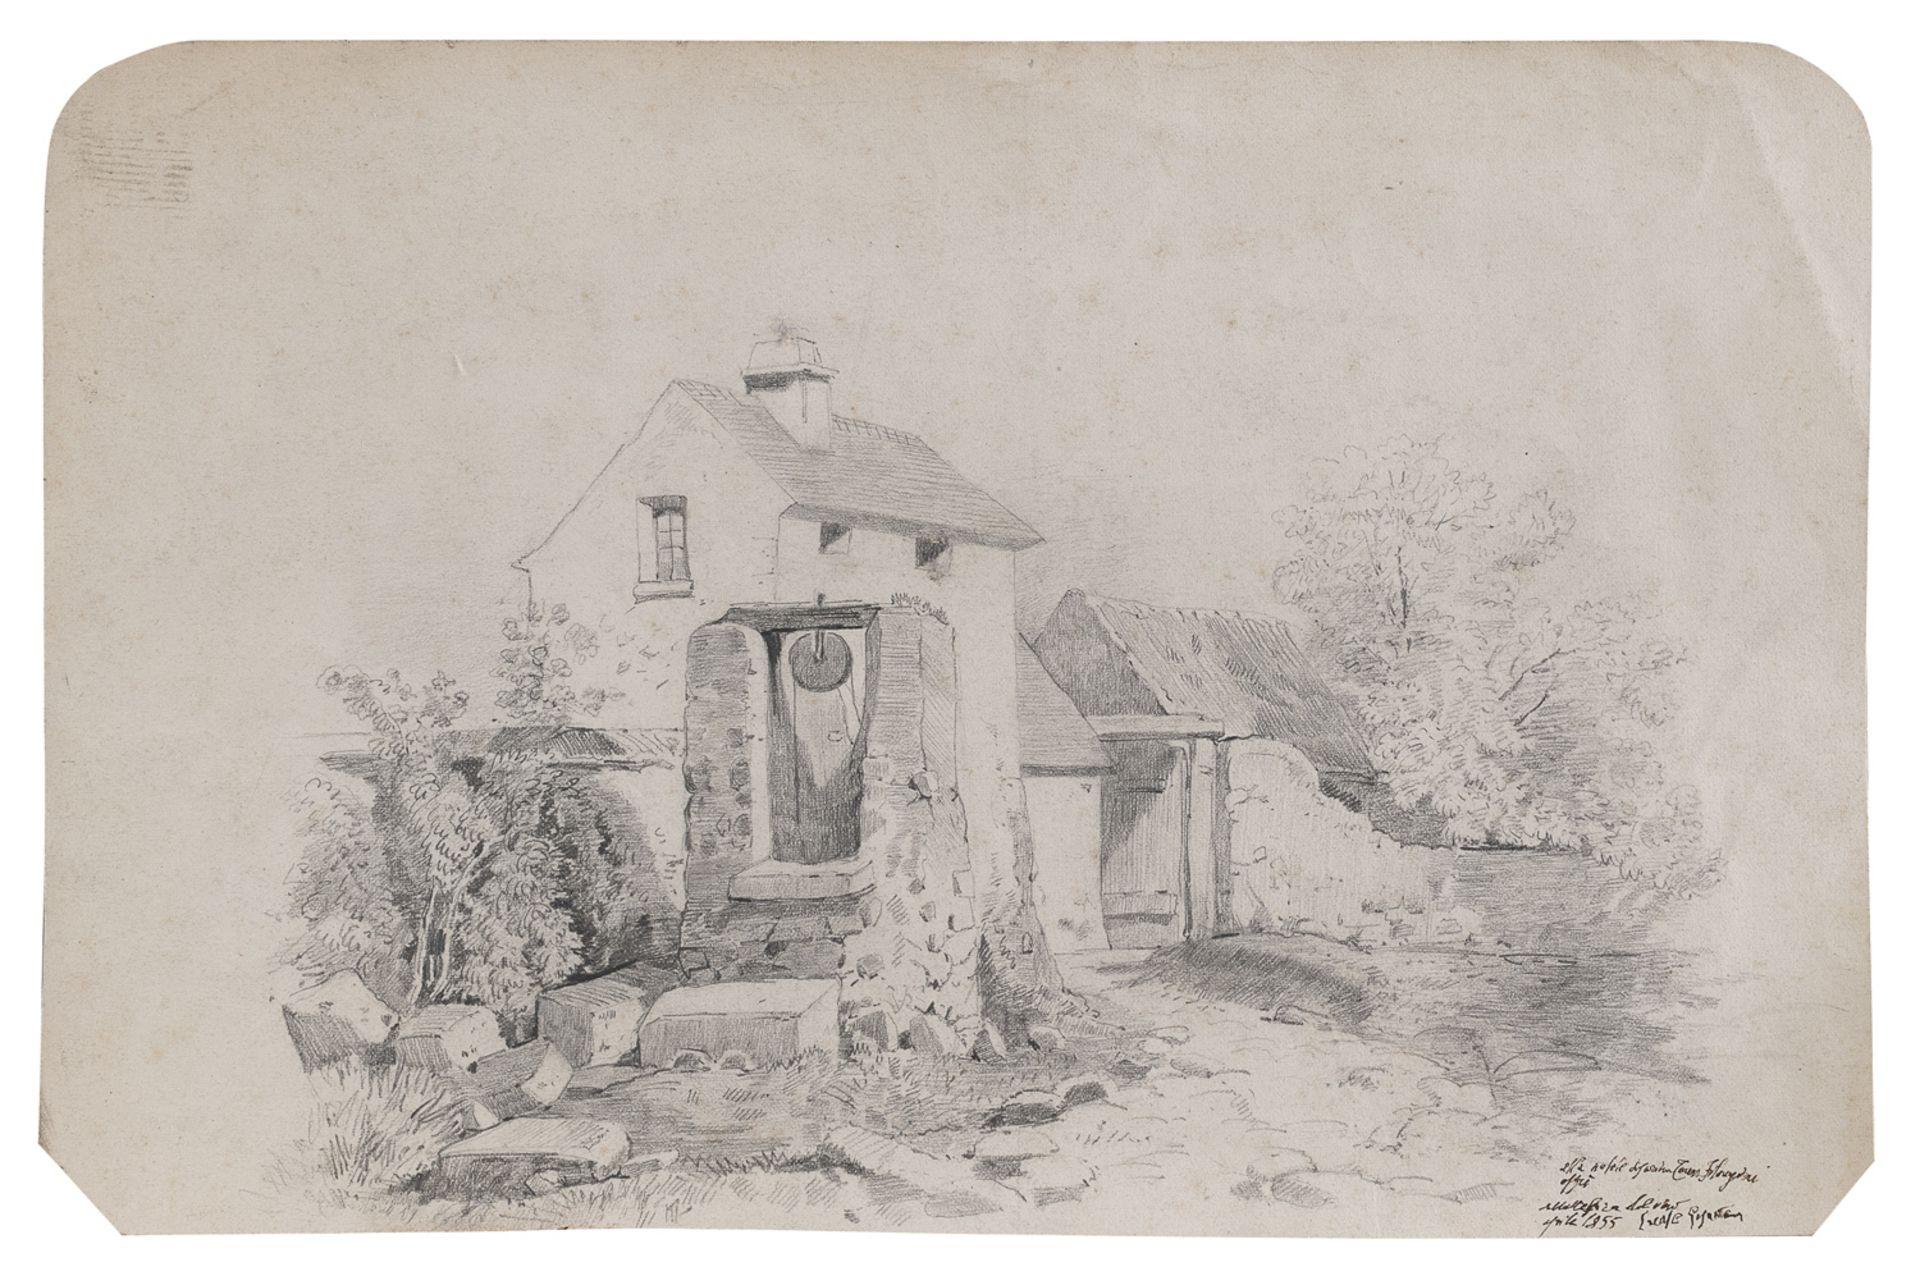 PENCIL DRAWING OF A FARM 19TH CENTURY